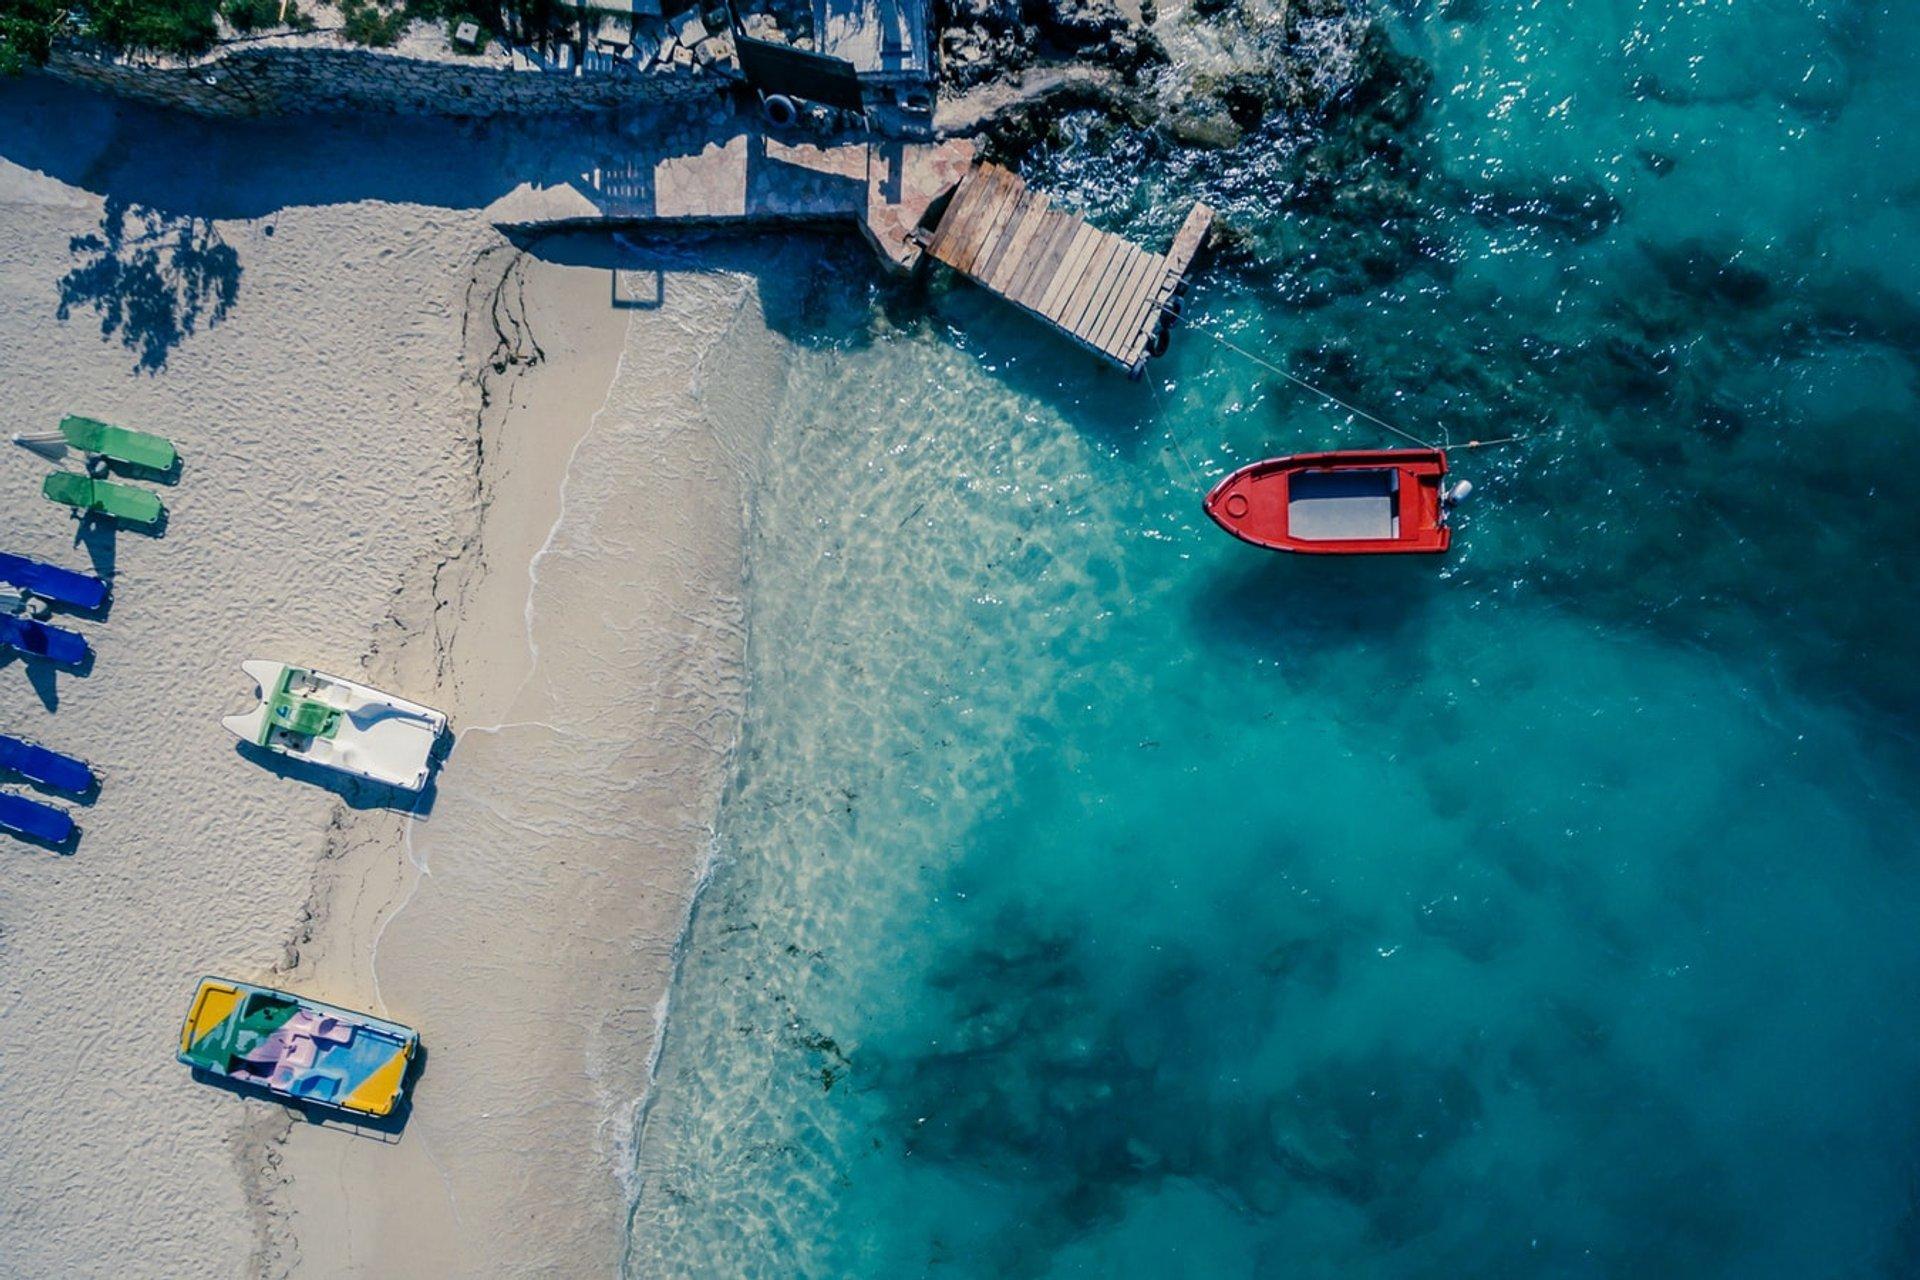 Beach Season in Albania 2020 - Best Time